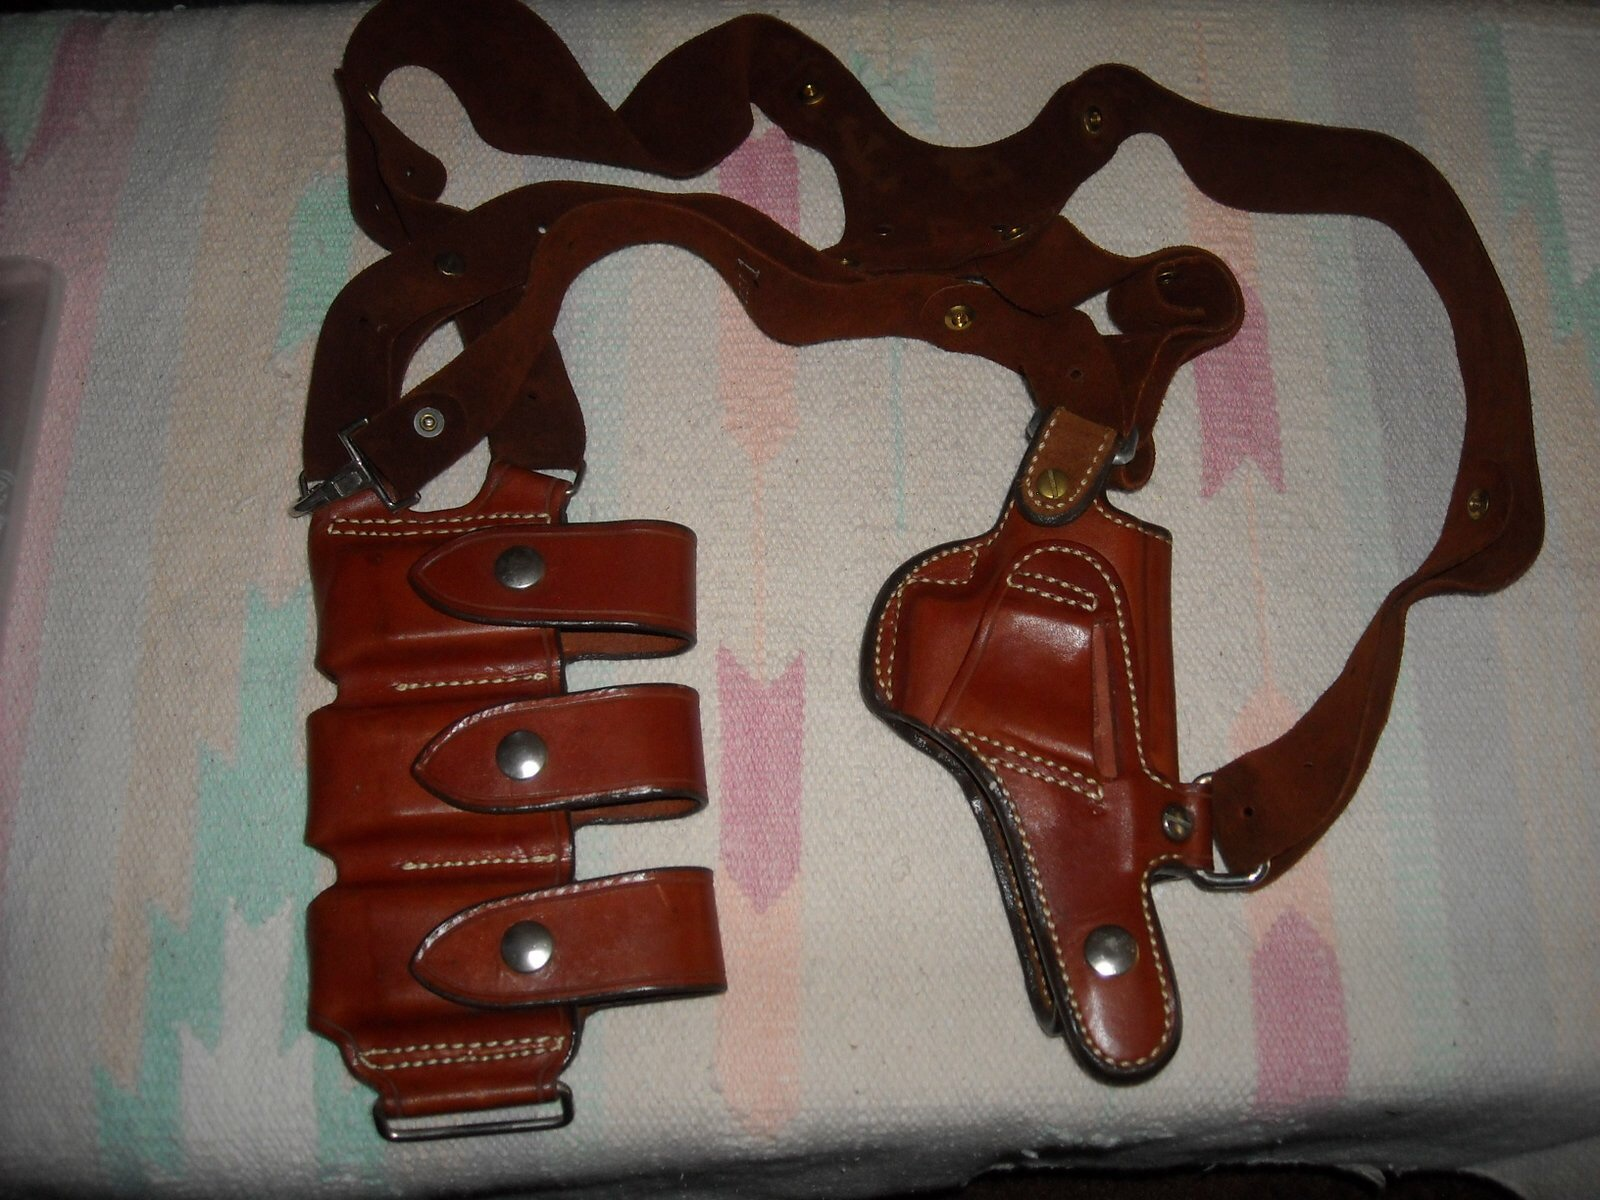 Andrews Custom Shoulder Holster - Glock 26/27